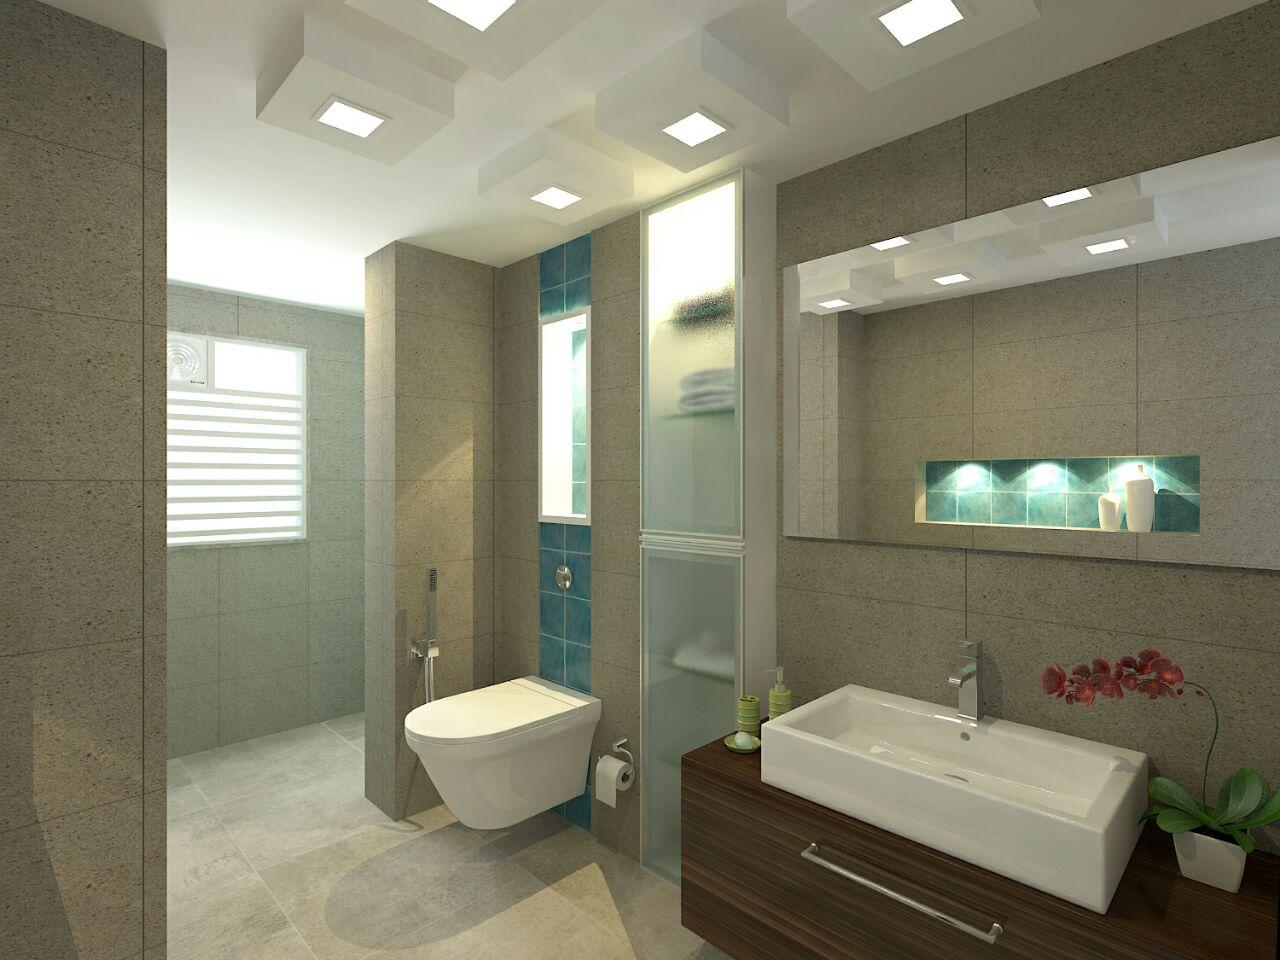 Grey Bathroom Interiors With White Blocked False Ceiling by VERSATILE INTERIORS  Bathroom Modern | Interior Design Photos & Ideas